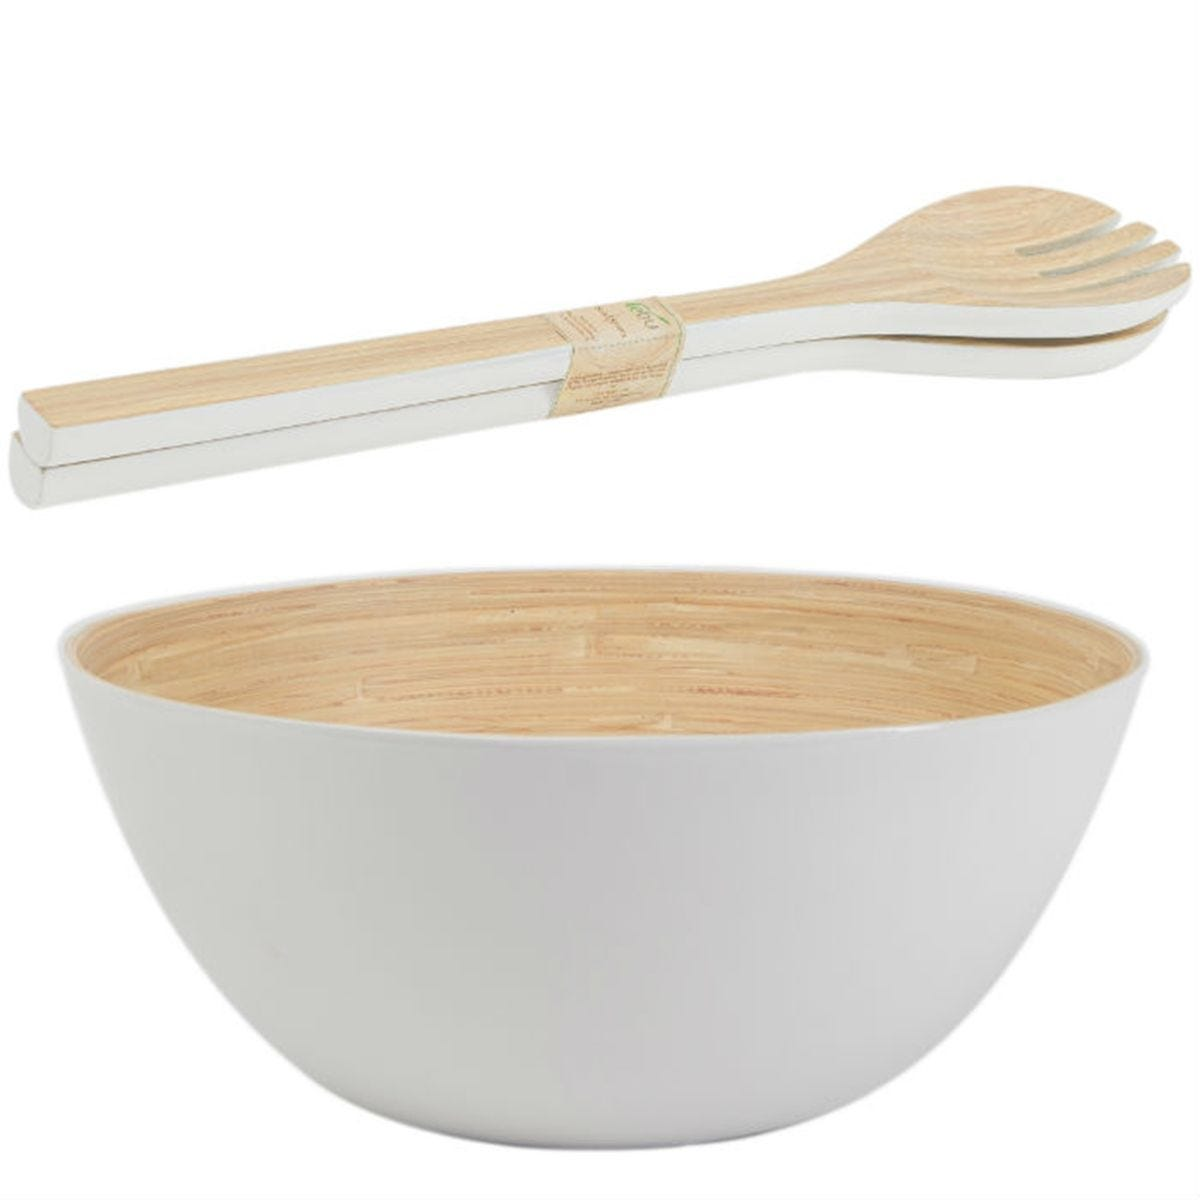 Rebu White Bamboo Salad Bowl and Servers